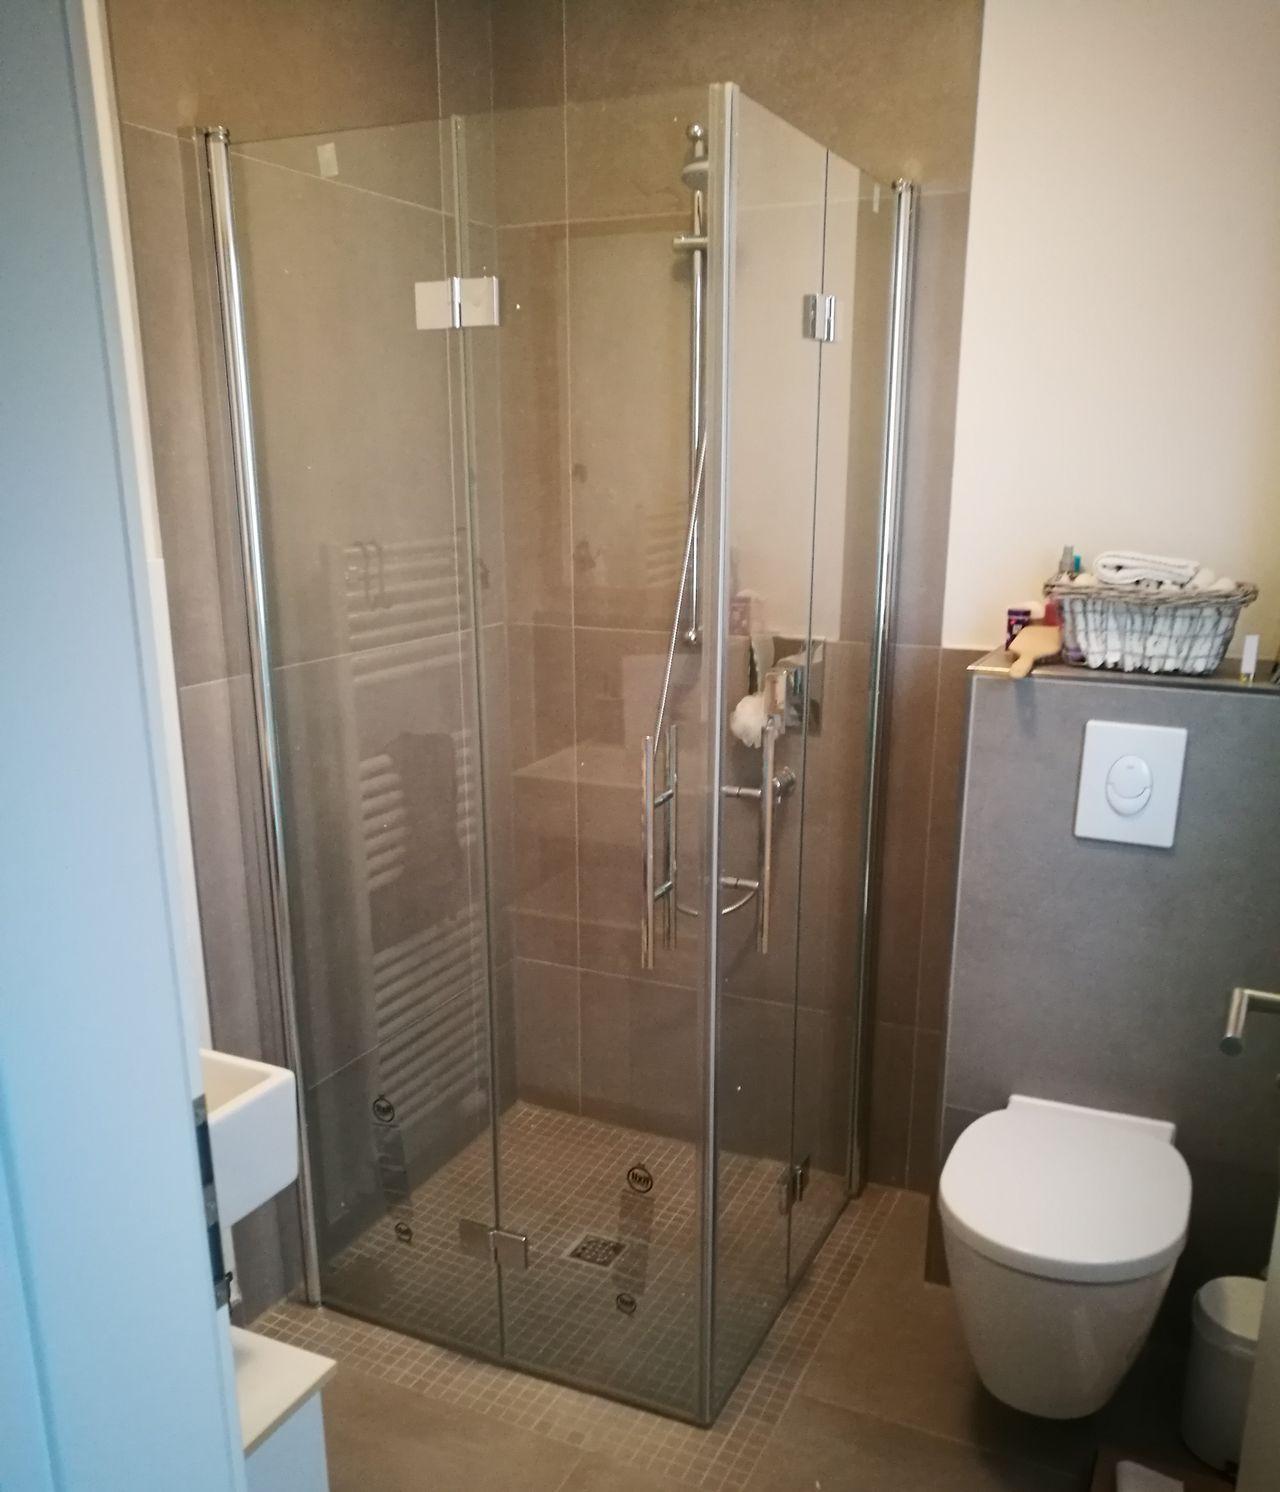 Bathroom Shower Domestic Bathroom Door Reflection Home Interior Luxury Indoors  Residential Building No People Home Showcase Interior Domestic Room Bathroom Sink Sliding Door Day